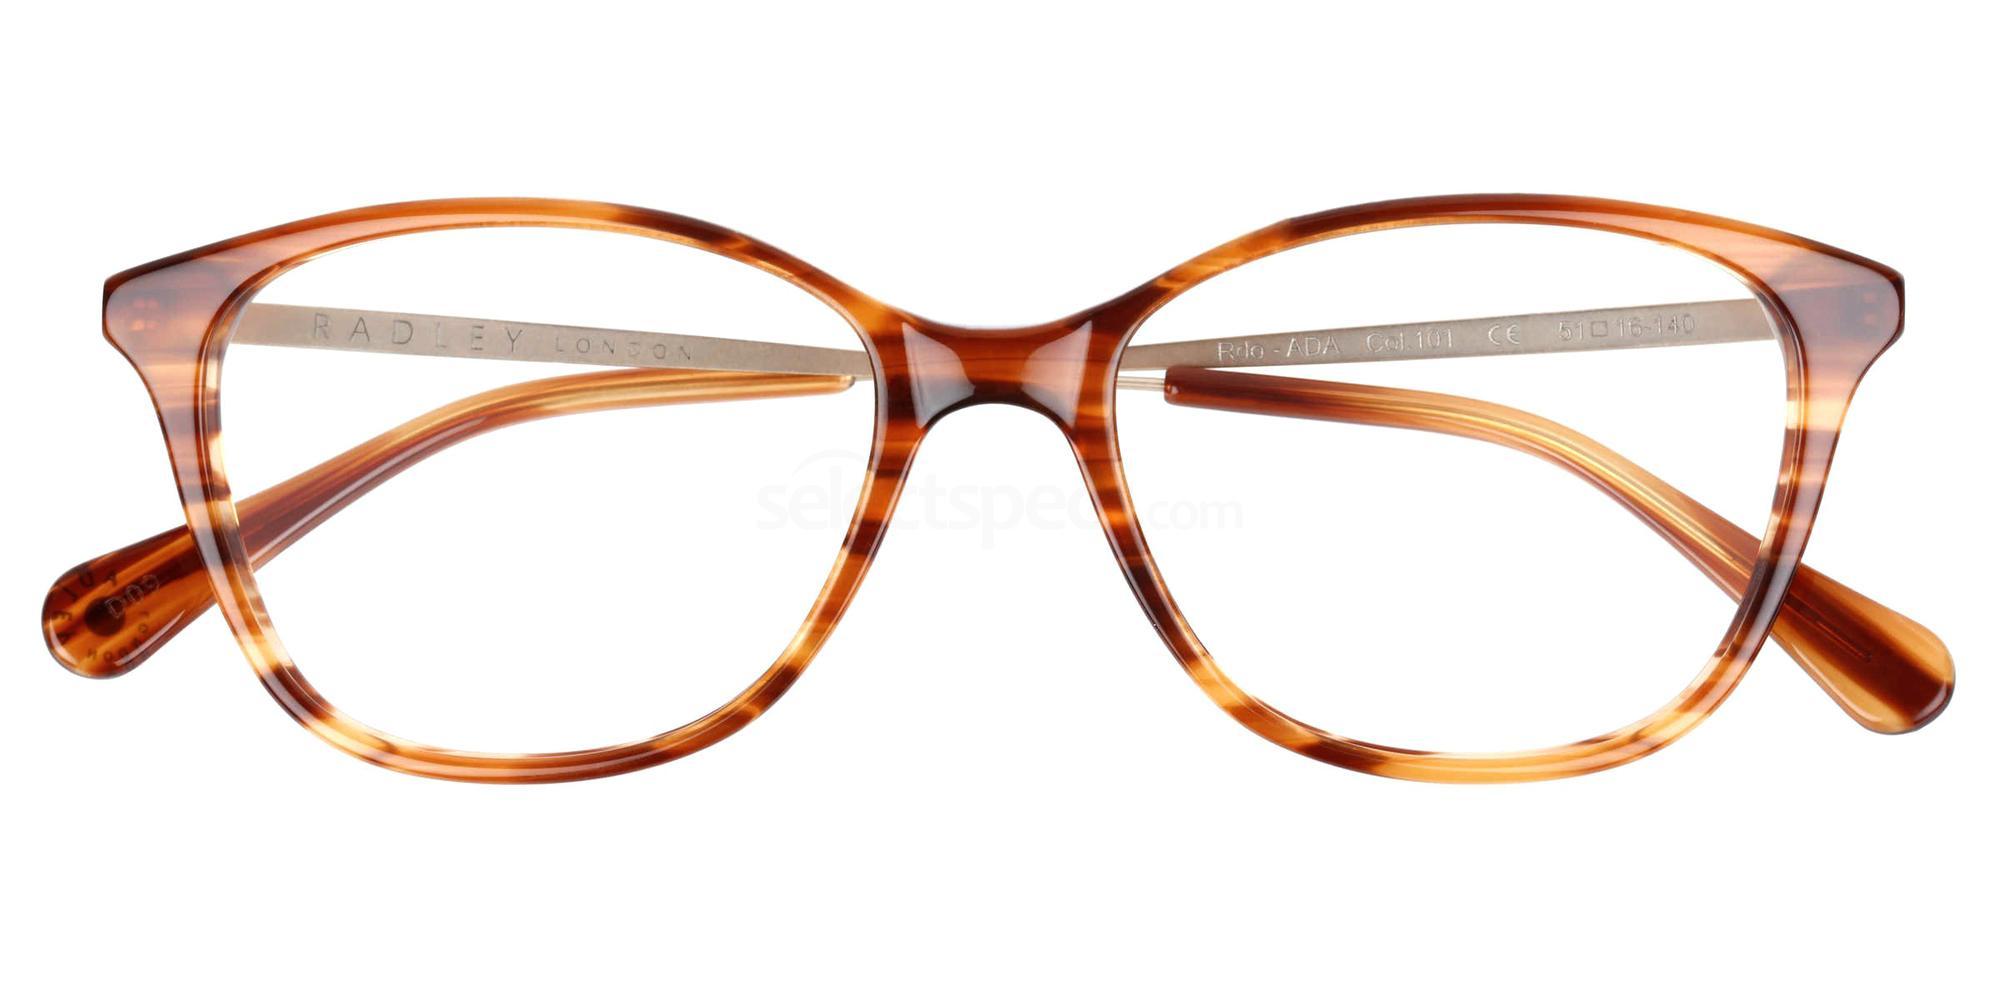 101 RDO-ADA Glasses, Radley London